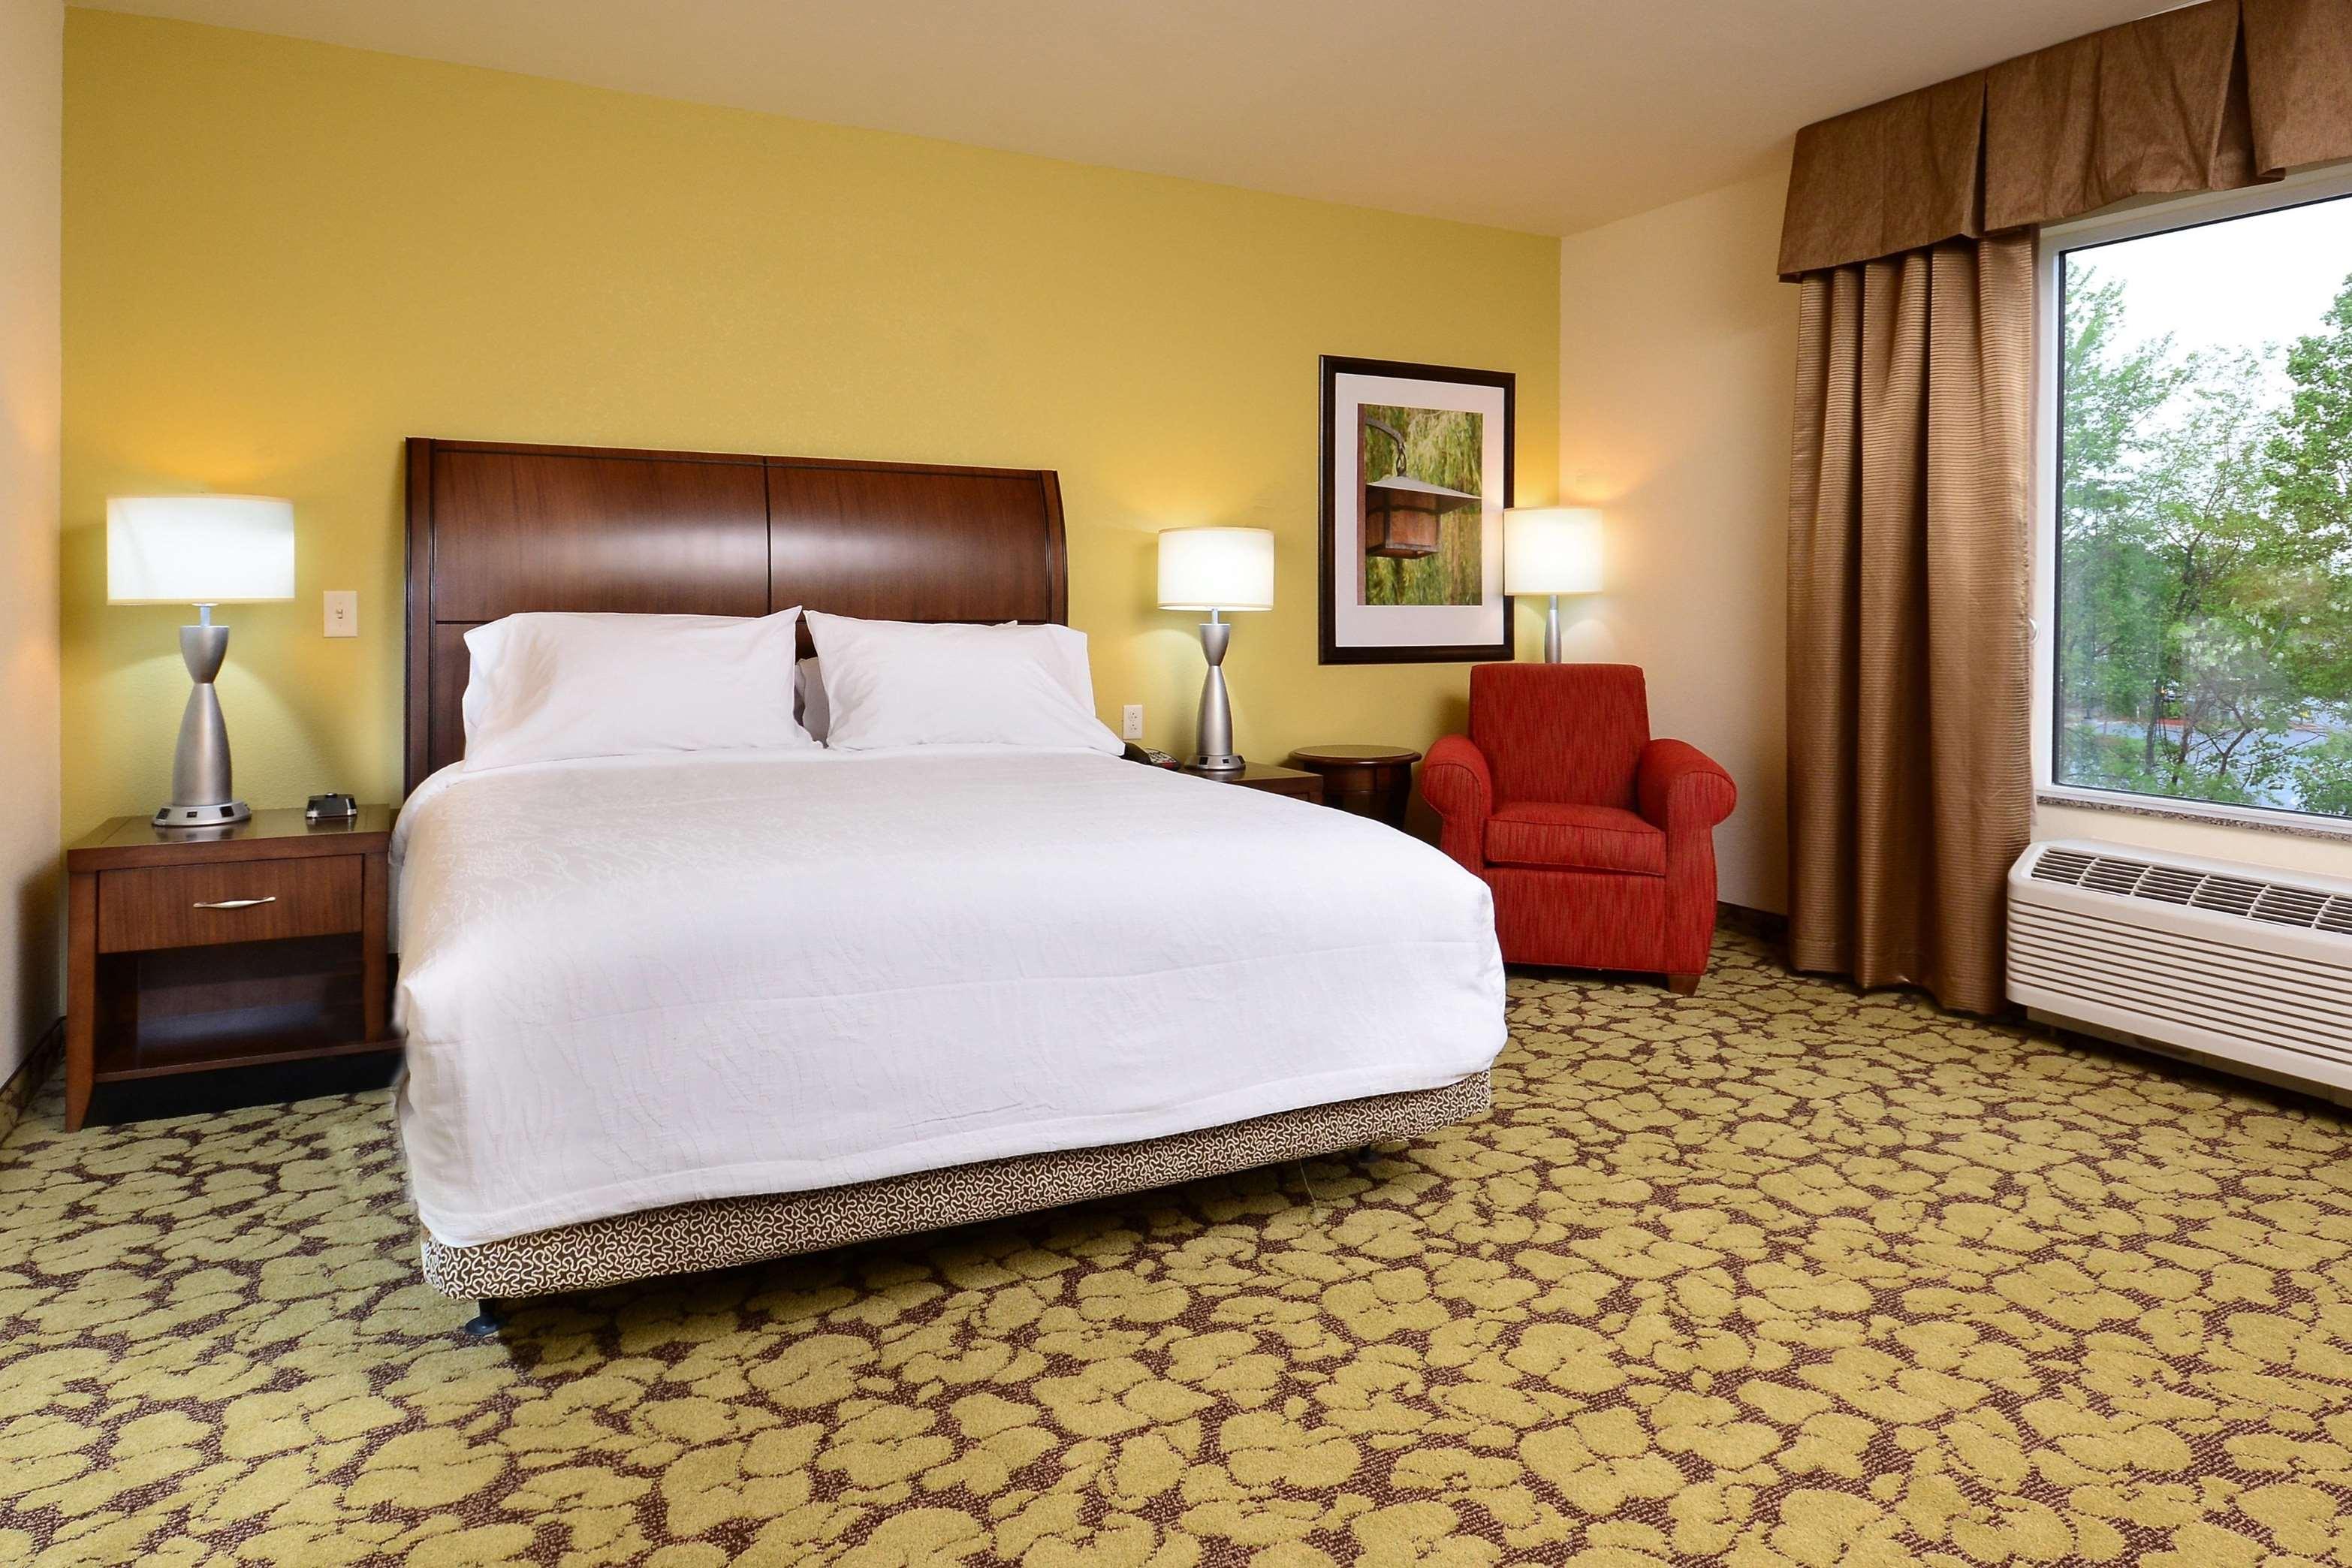 Wonderful Hilton Garden Inn Greensboro Airport   Greensboro, NC 27409   (336)881 1111    ShowMeLocal.com Good Looking